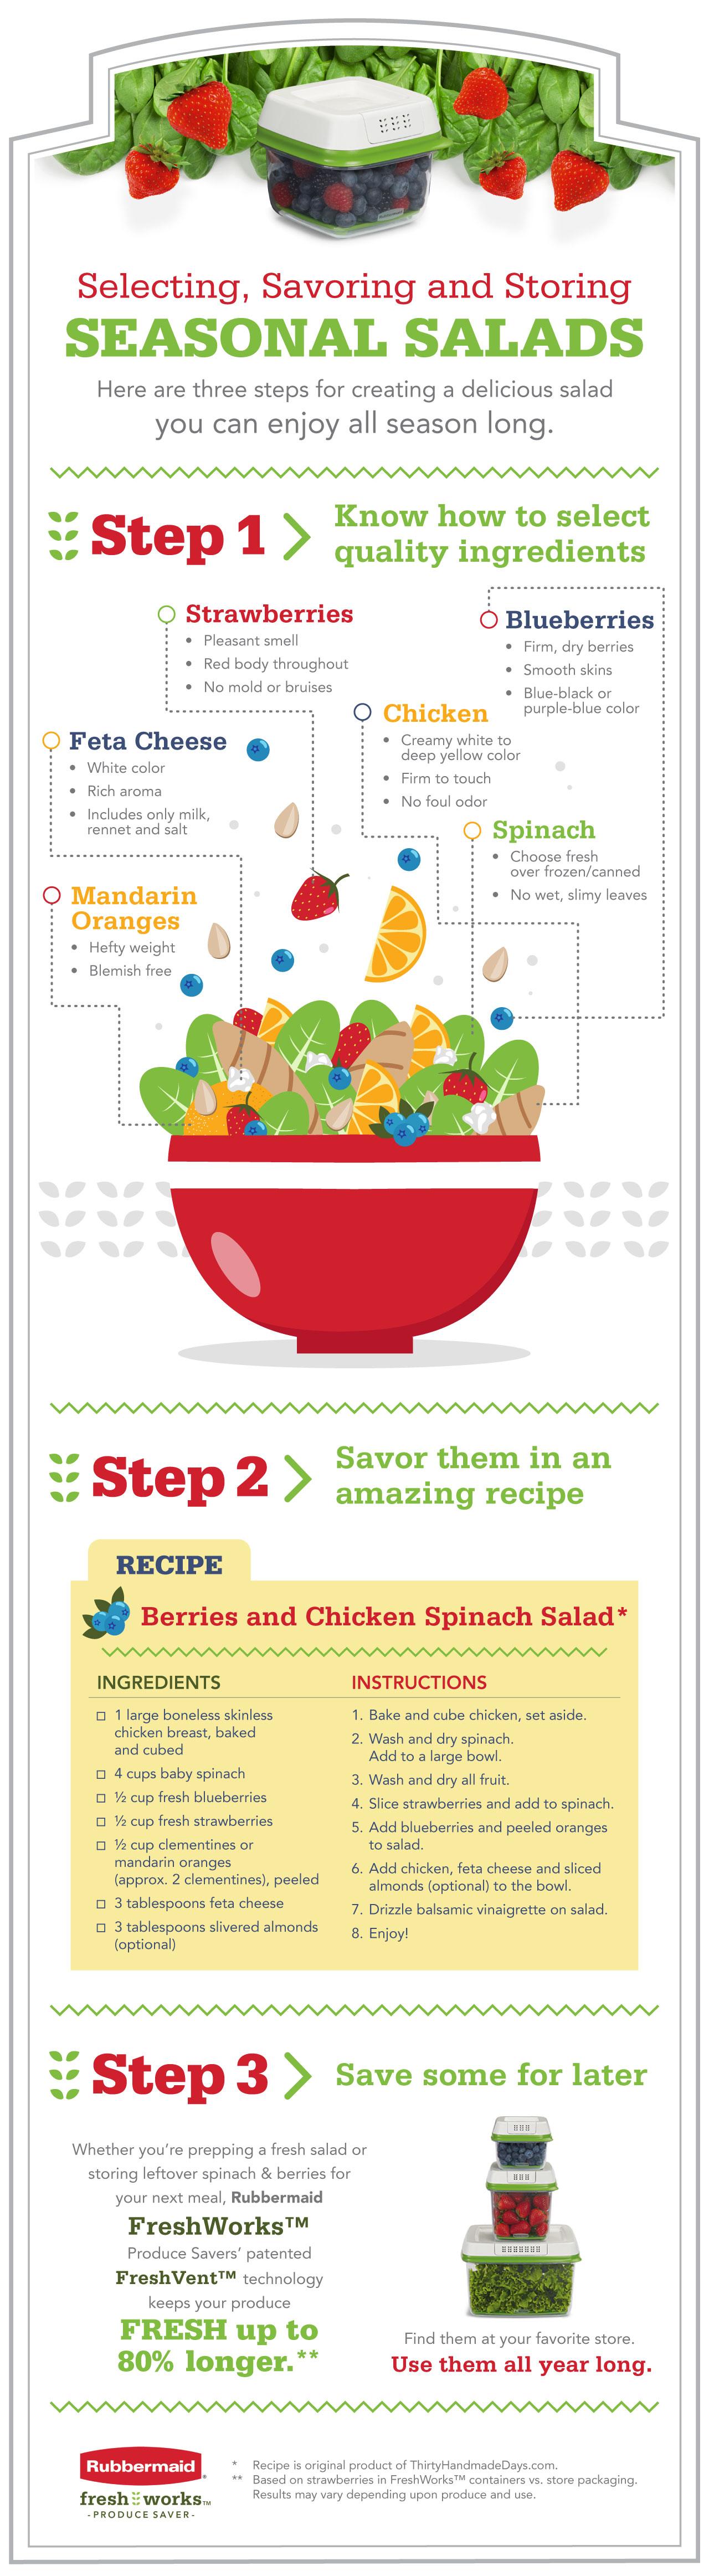 Selecting, Savoring and Storing Seasonal Salads